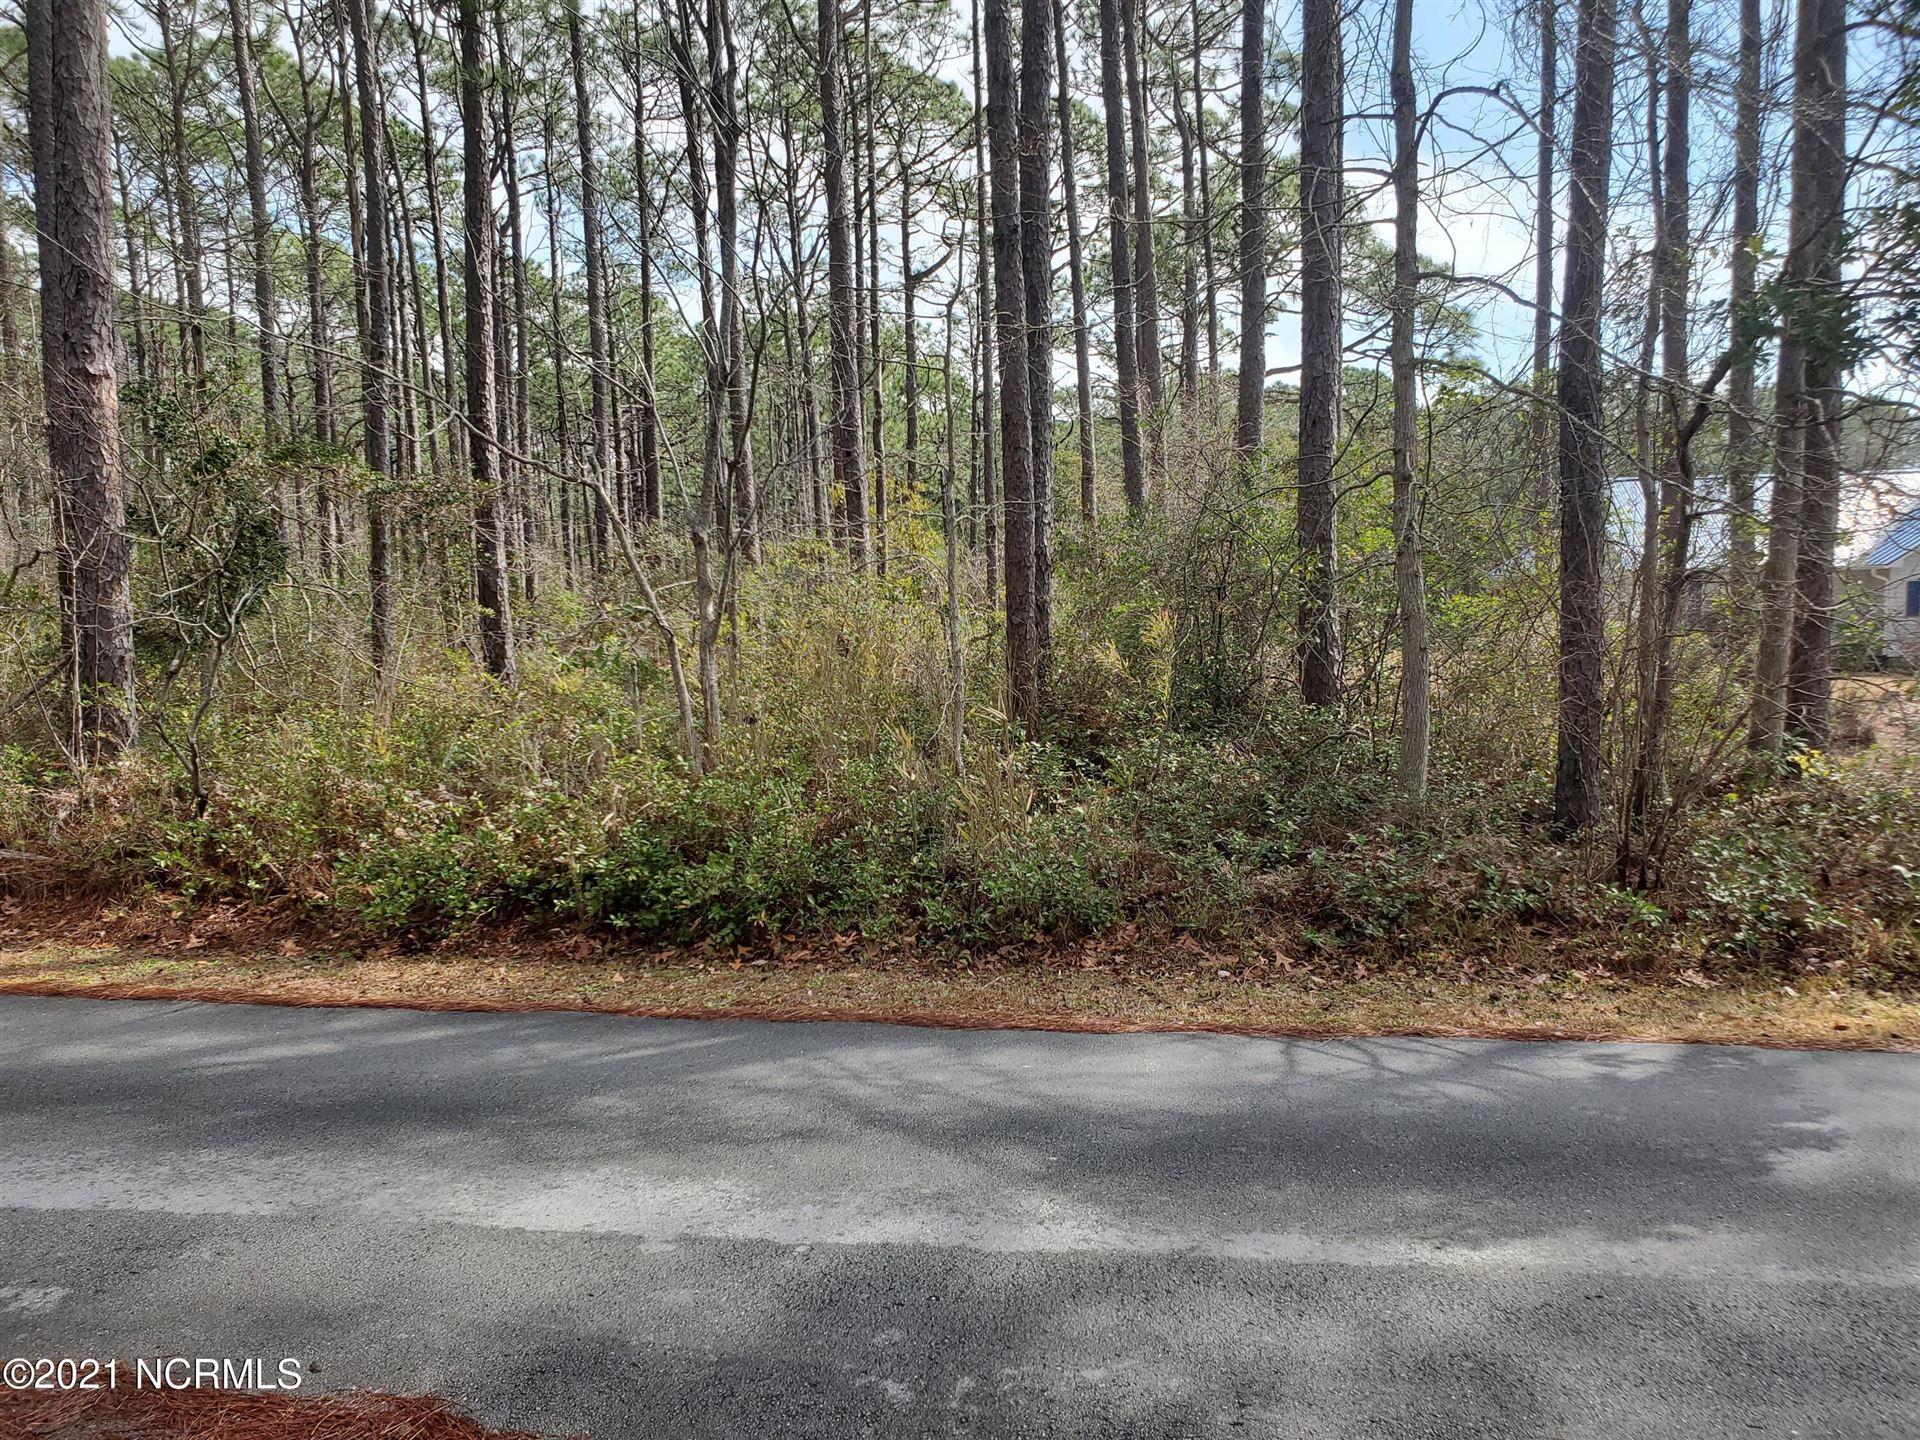 Photo of 127 Deep Bay Drive, Newport, NC 28570 (MLS # 100291463)